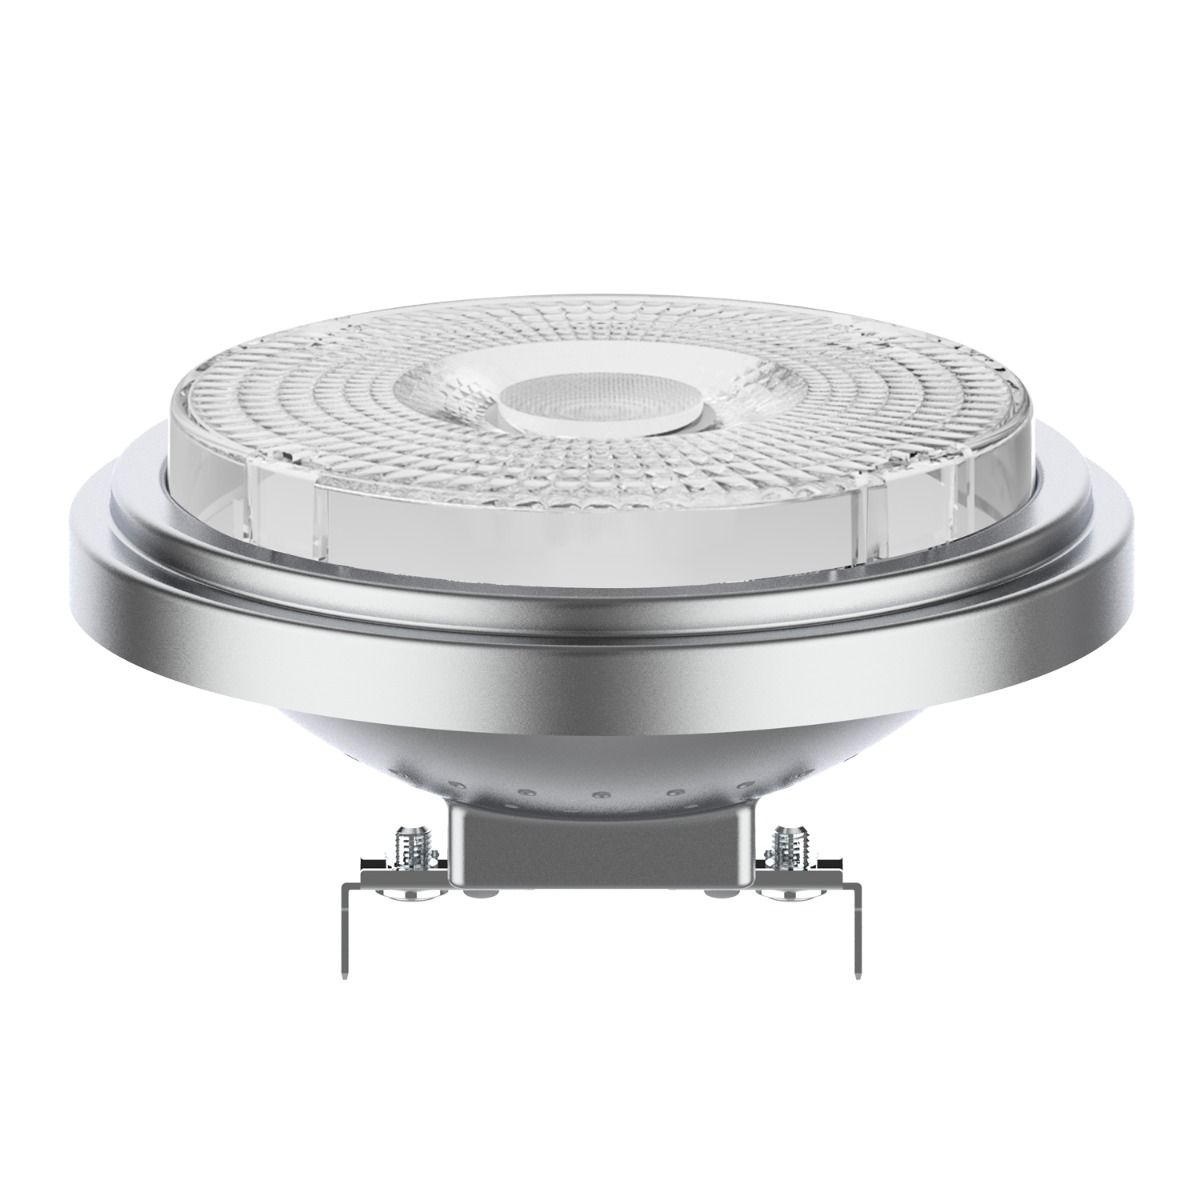 Noxion Lucent LED Spot AR111 G53 12V 7.3W 930 40D | Dimbaar - Hoogste Kleurweergave - Vervanger voor 50W